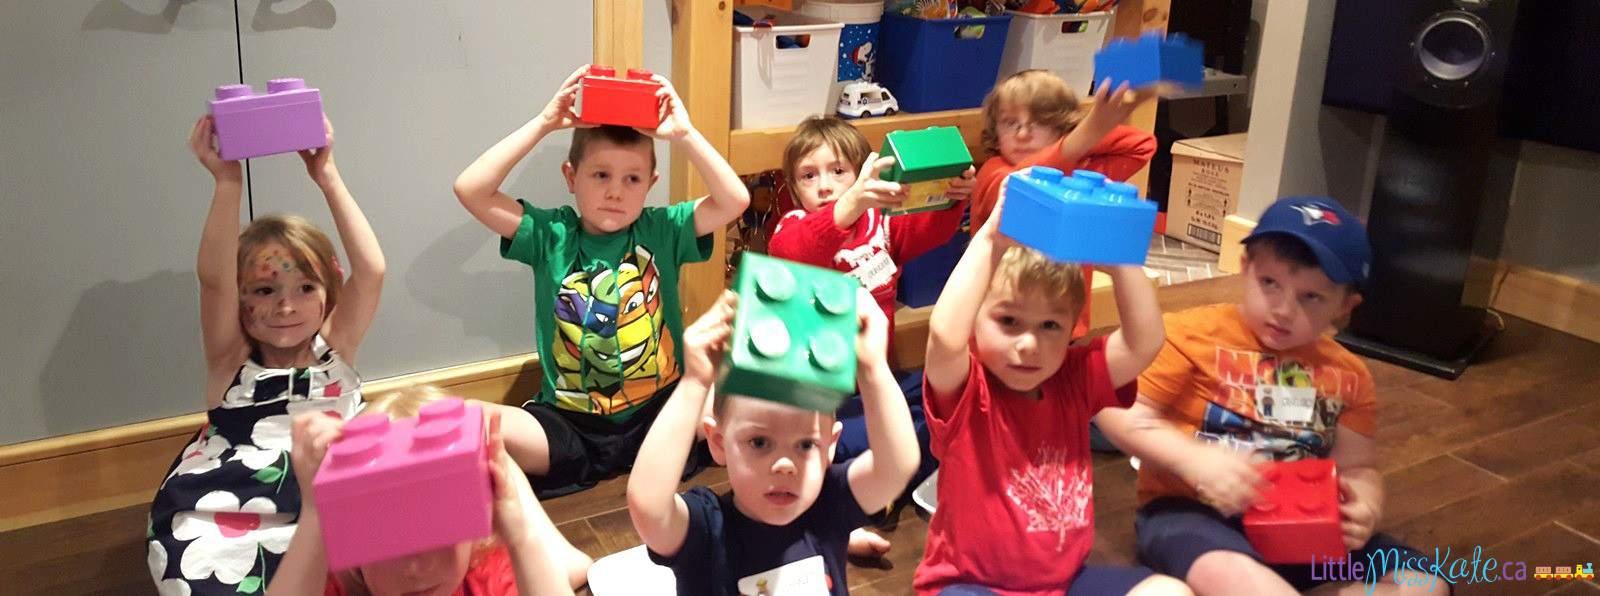 kids n bricks lego birthday party ideas